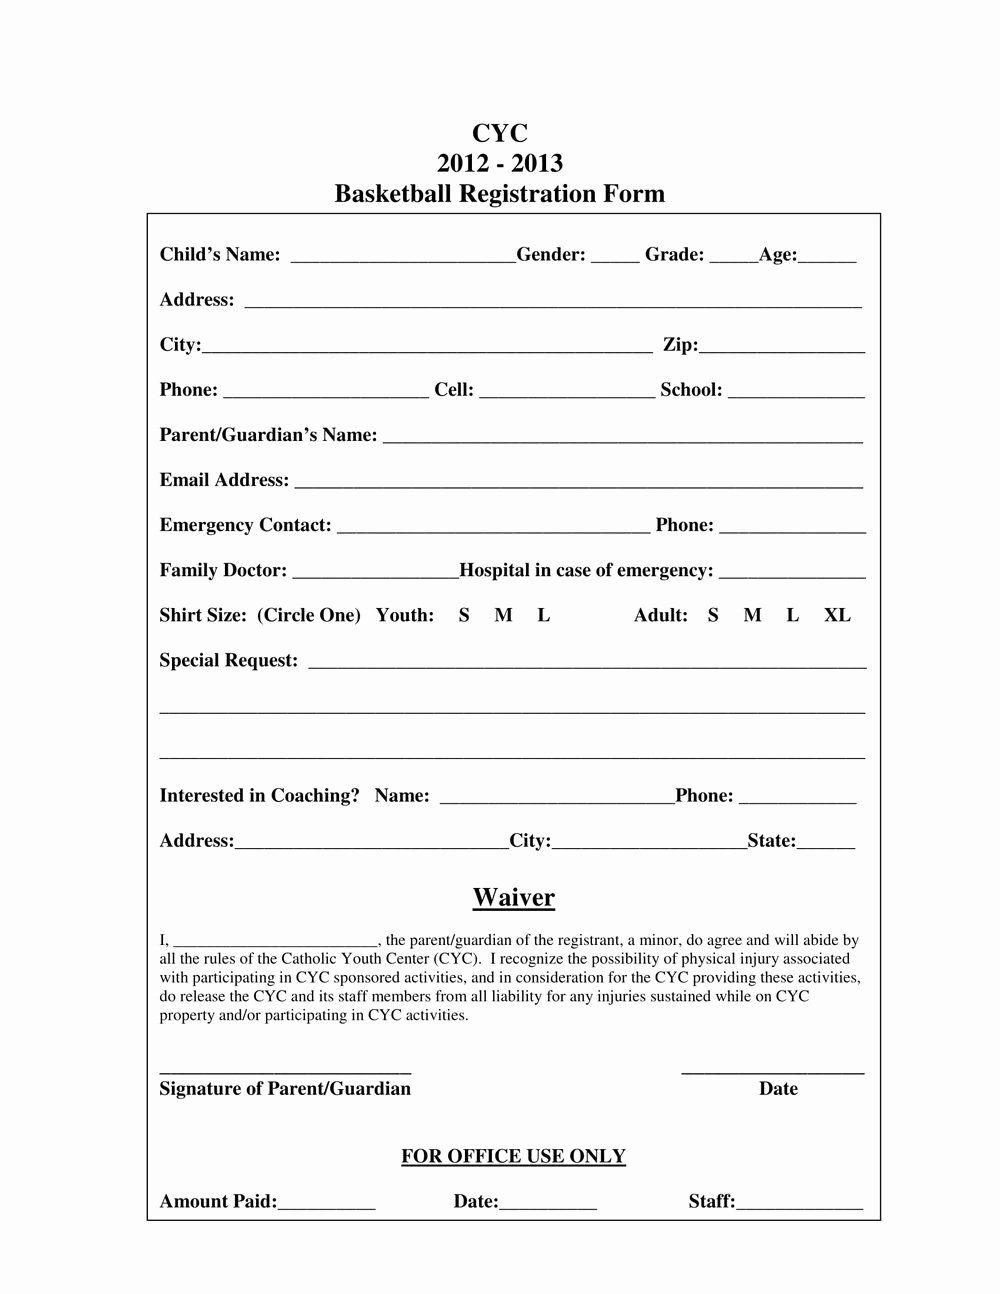 Sports Registration form Template in 2020 Registration